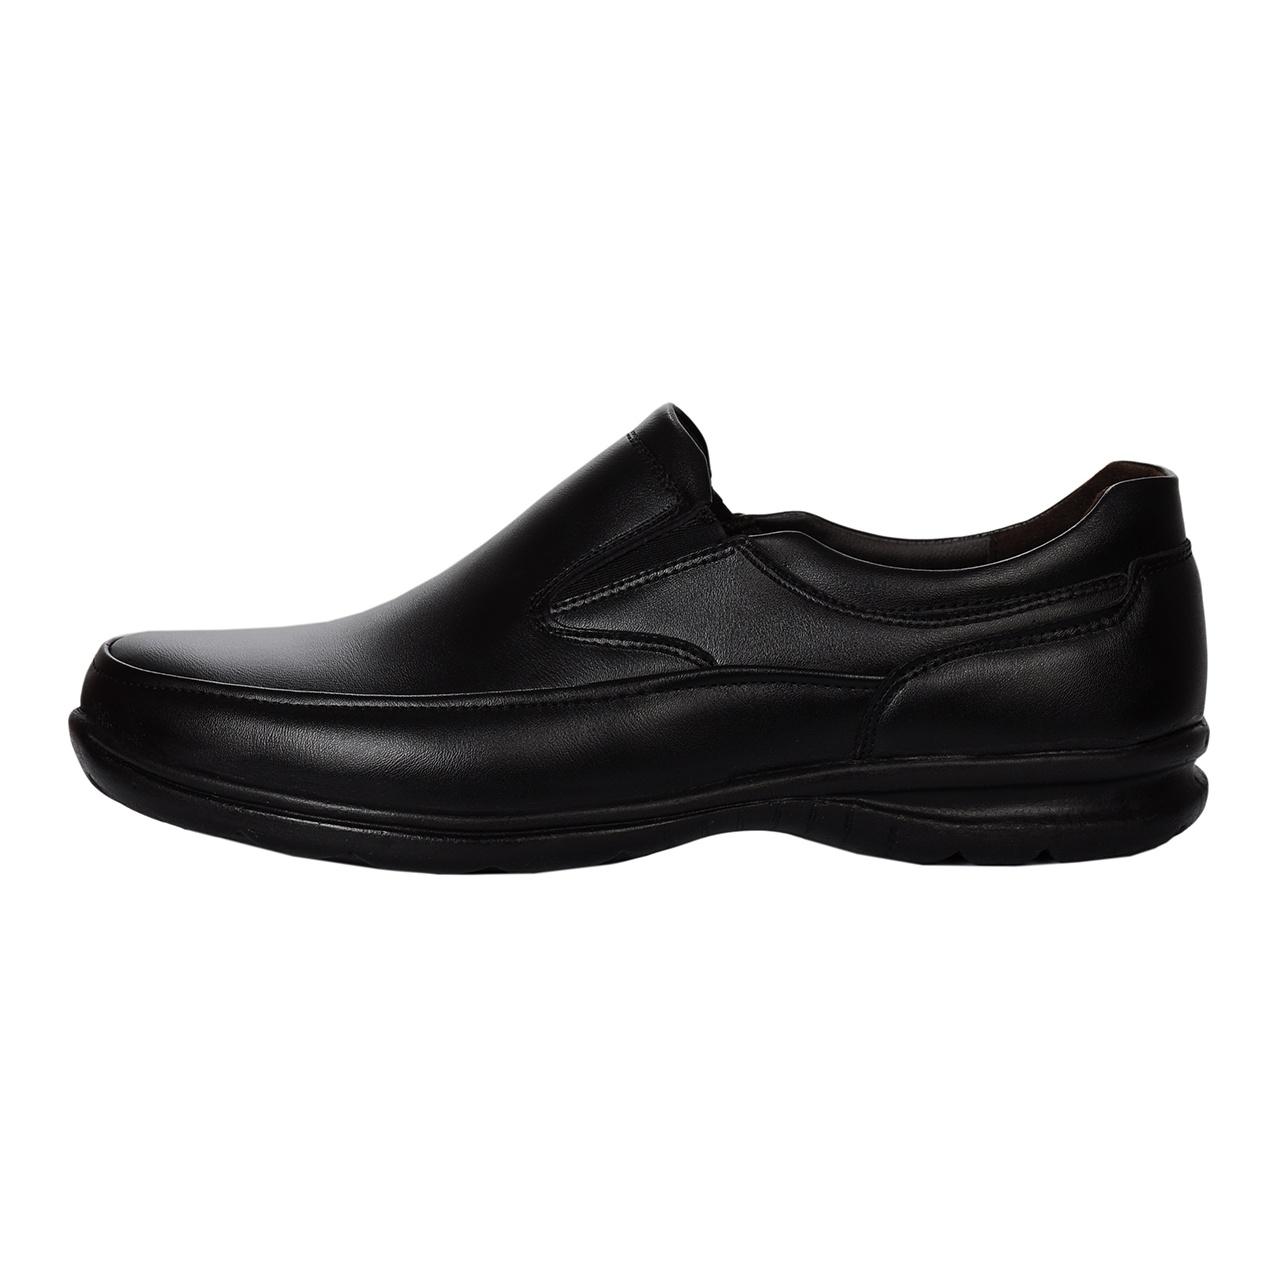 کفش روزمره مردانه مدل گارنر  ARM